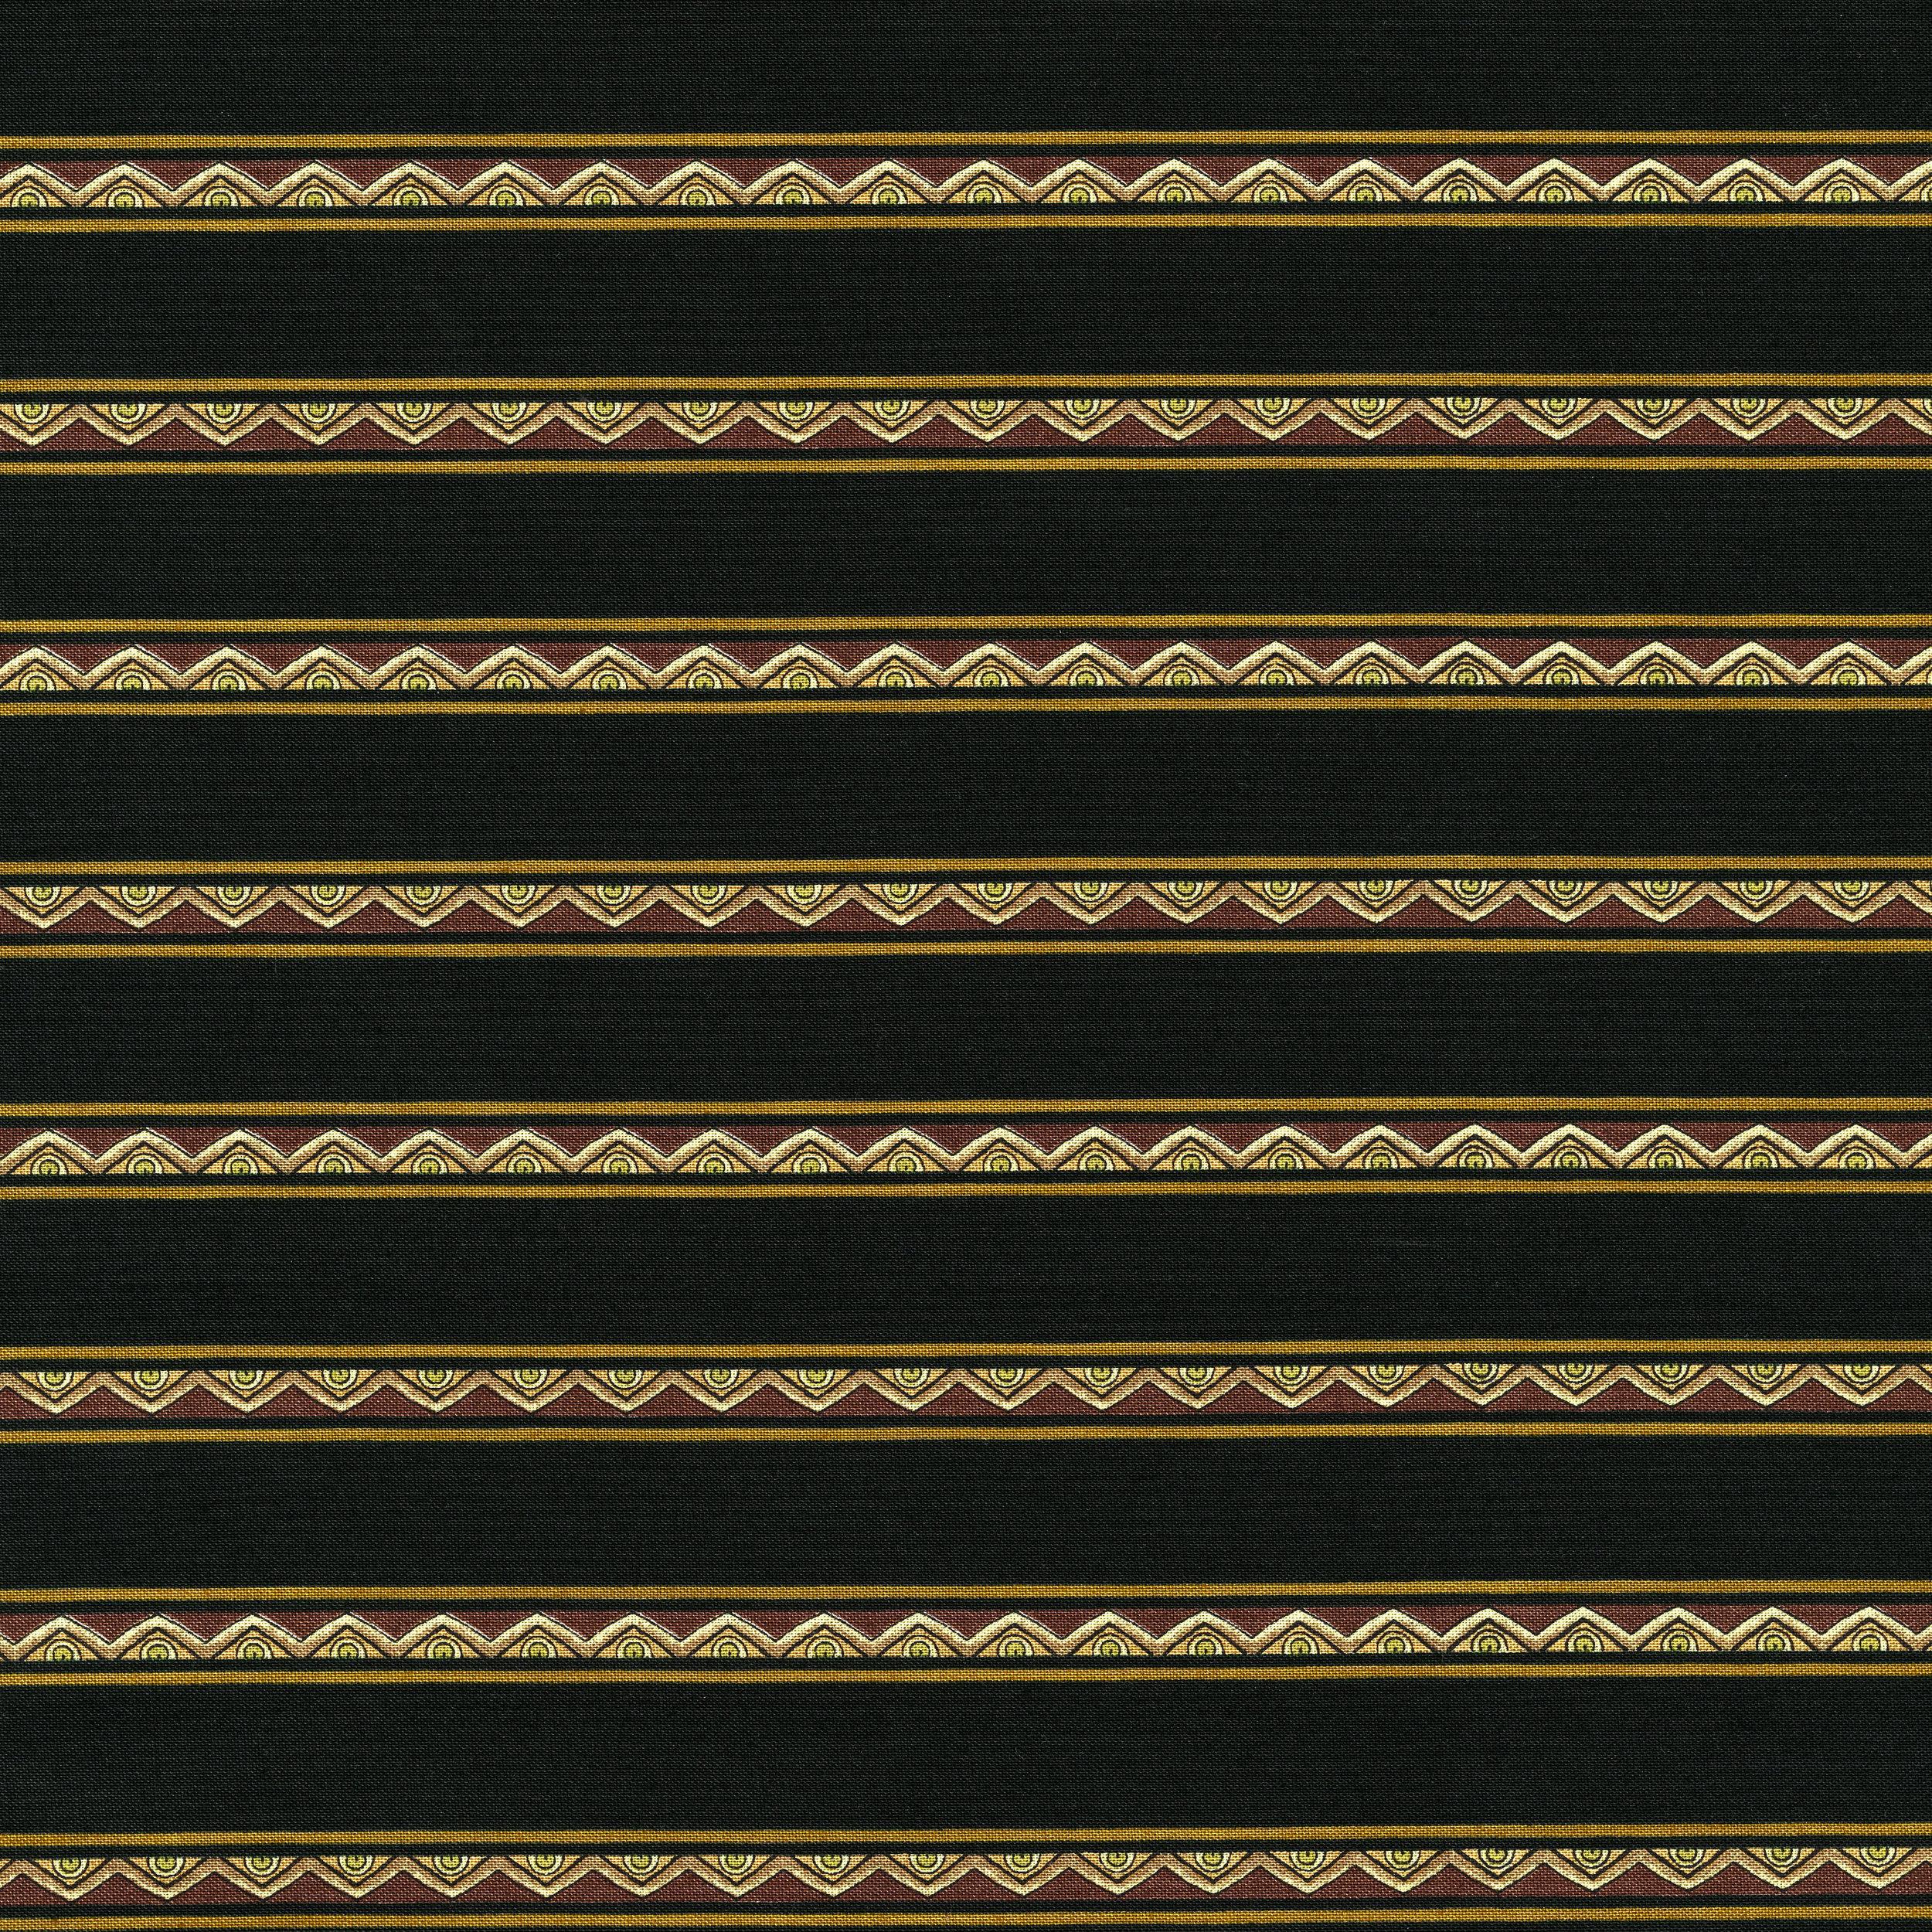 3287-002 MINI STRIPE-BROWN